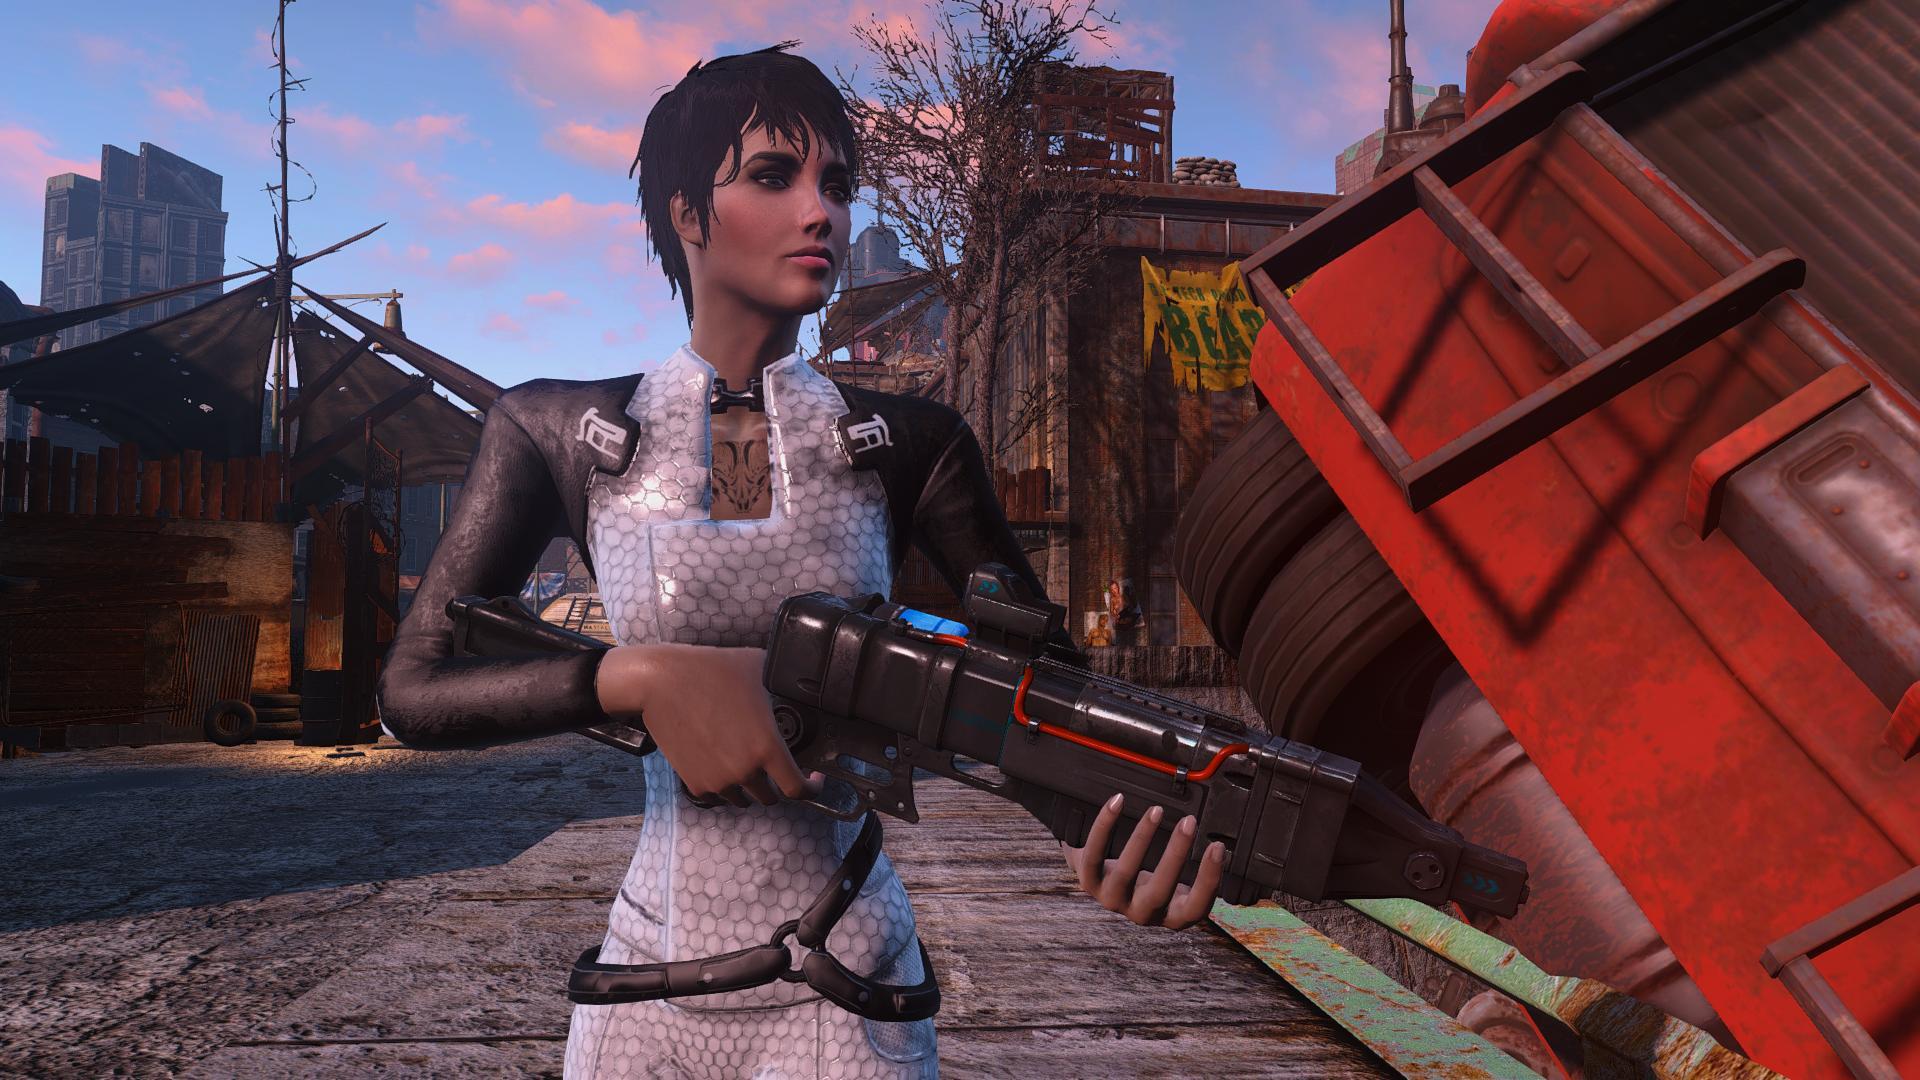 000497.Jpg - Fallout 4